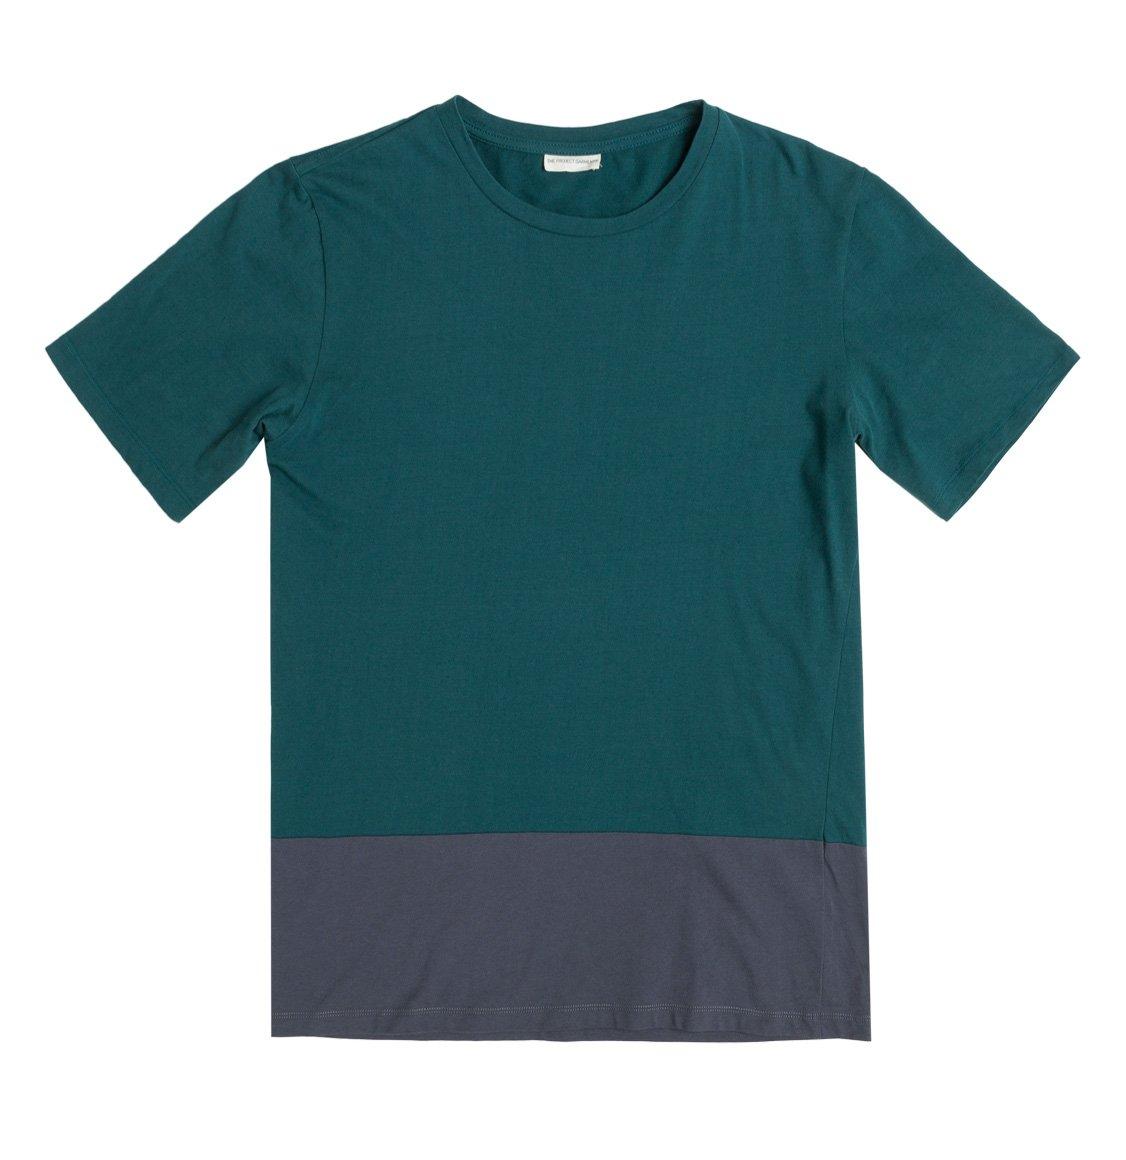 The Project Garments Color Block Crew Neck T-Shirt Green